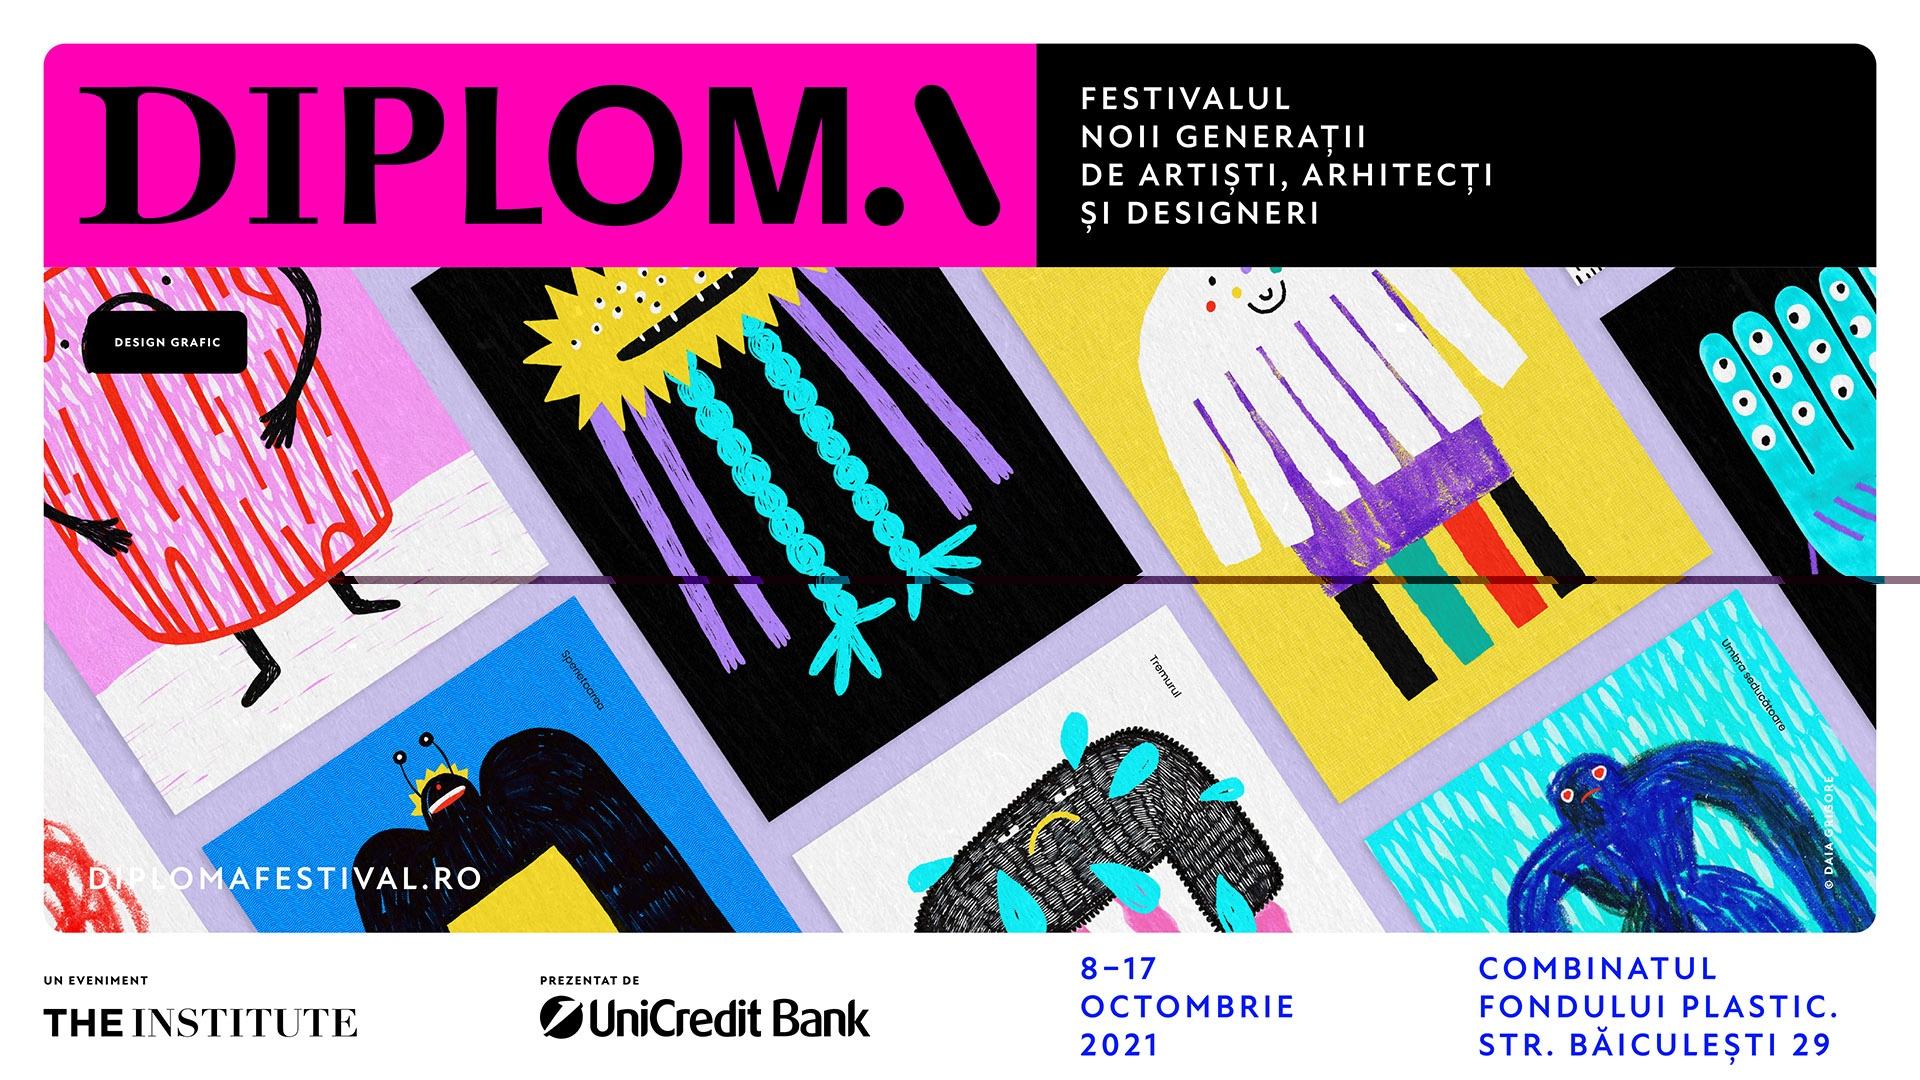 Diploma festival 2021